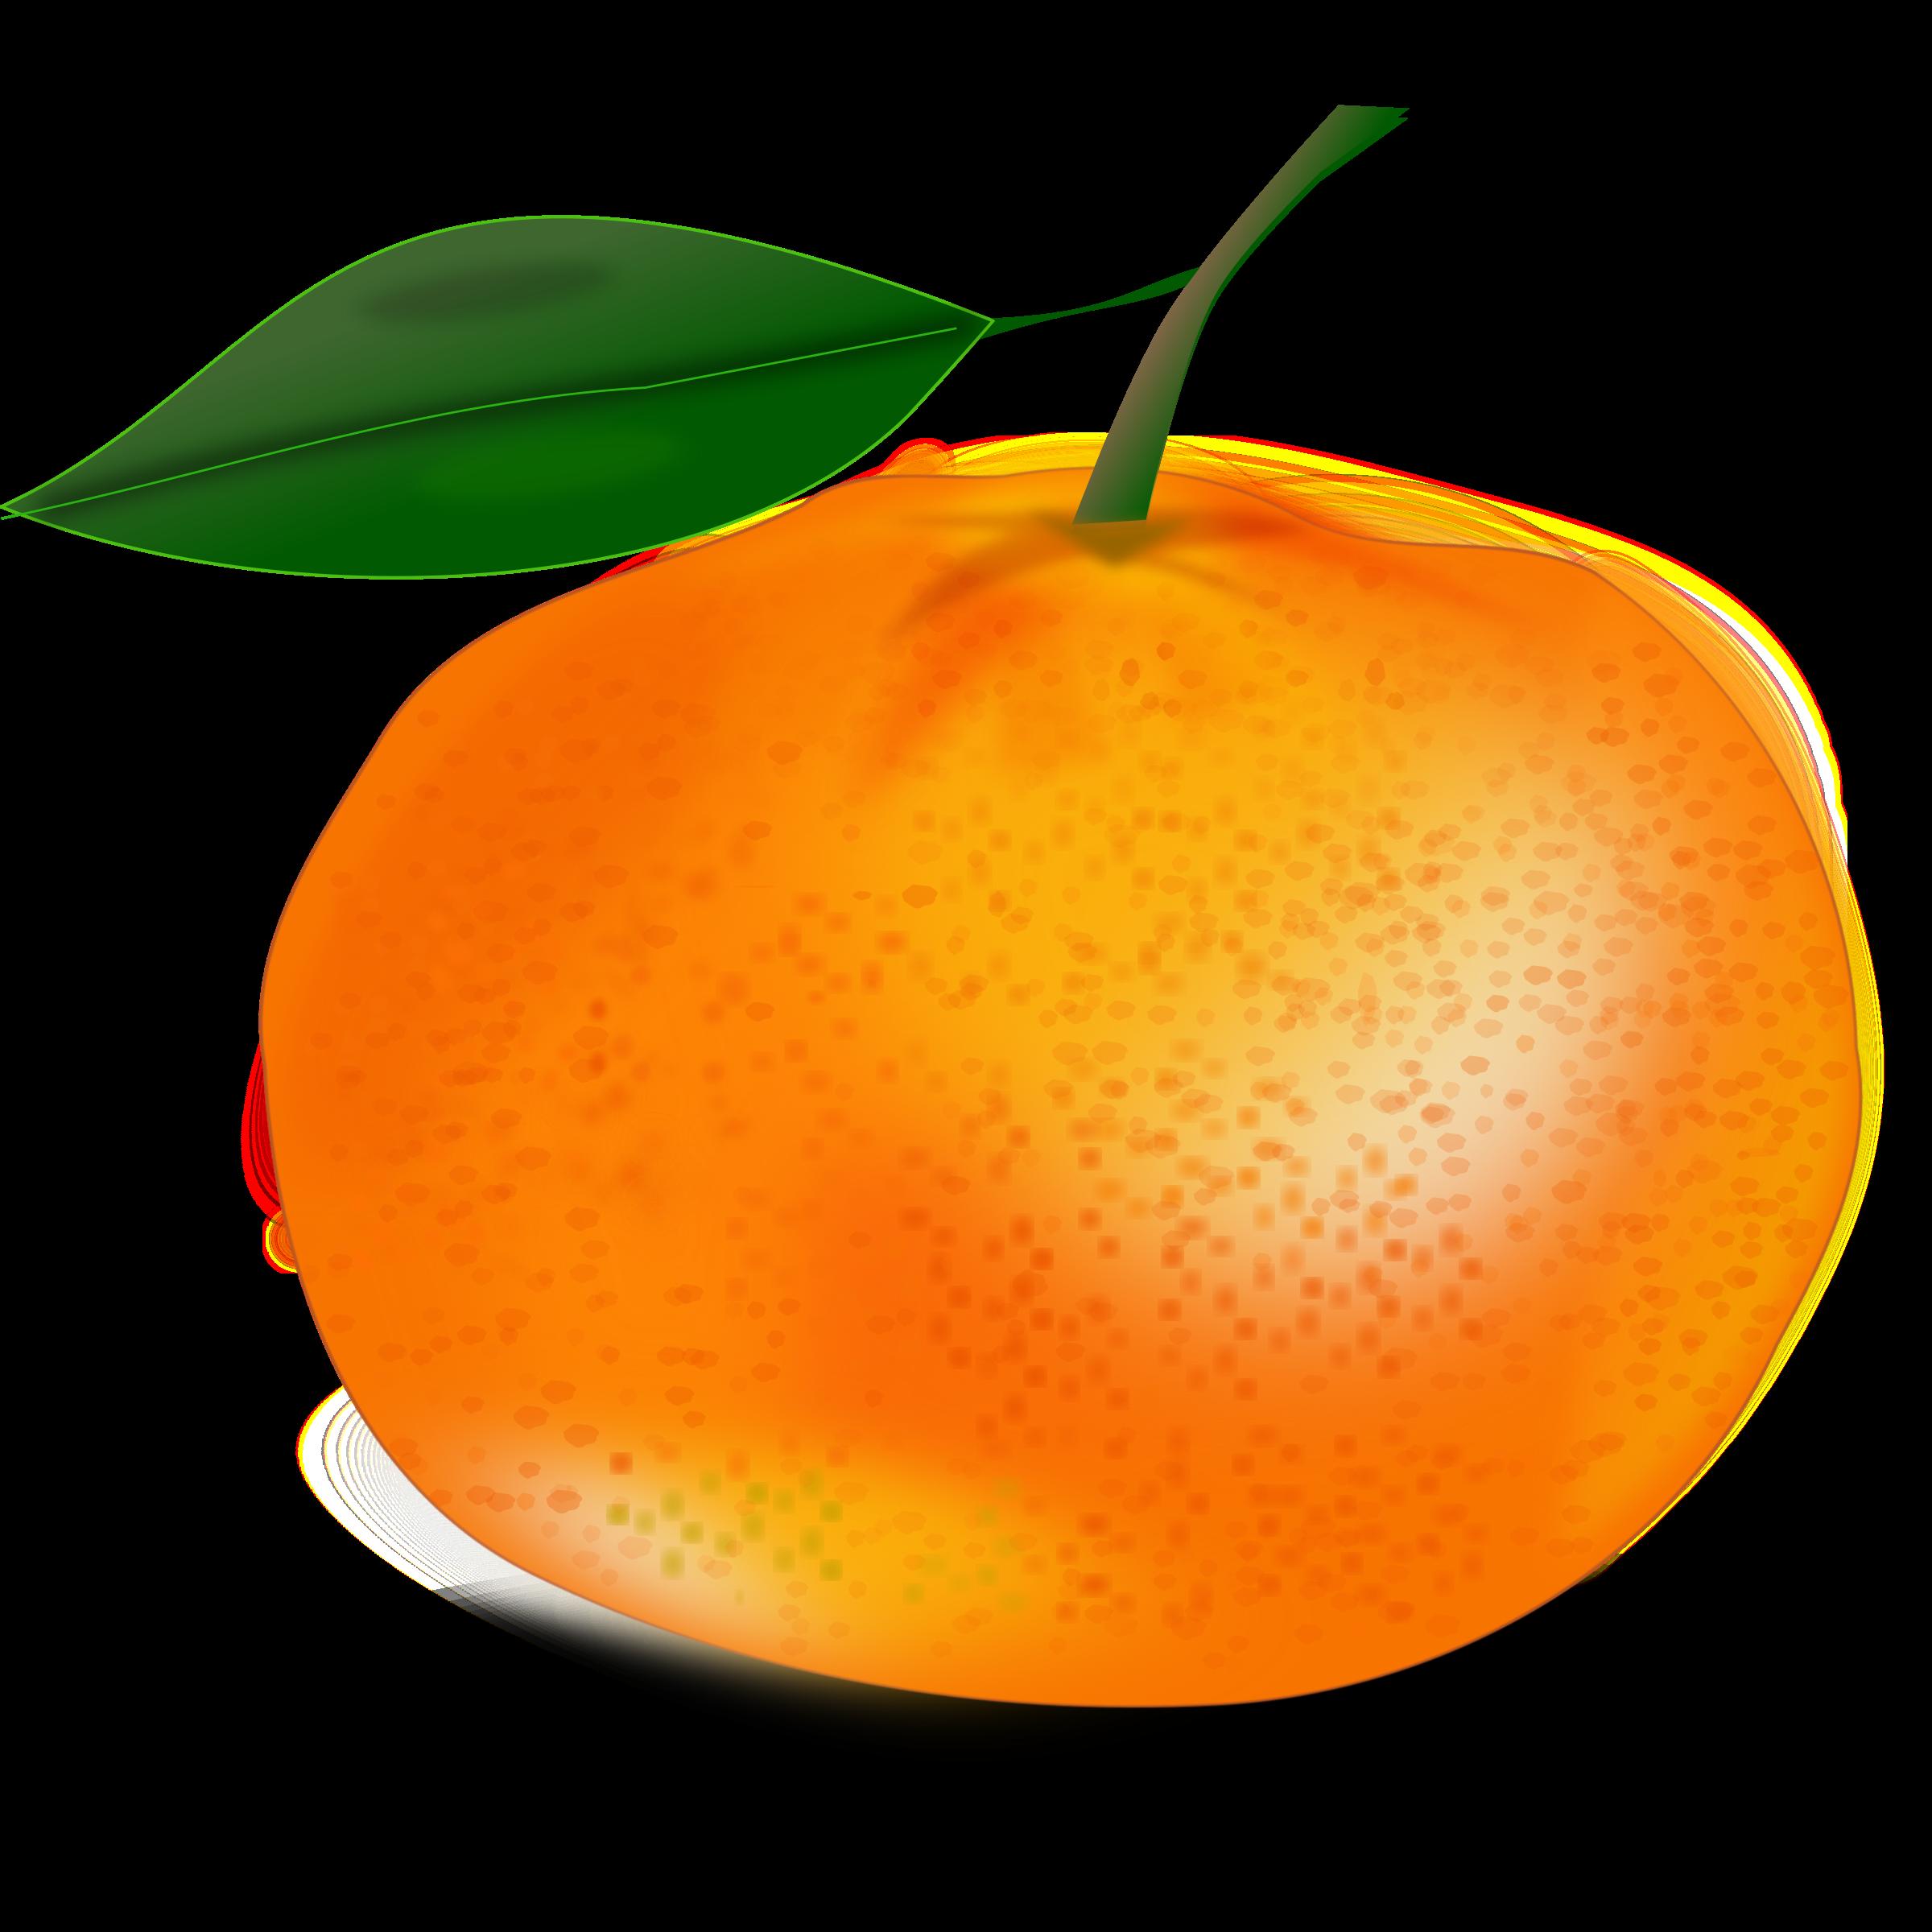 Big image png. Picture clipart orange